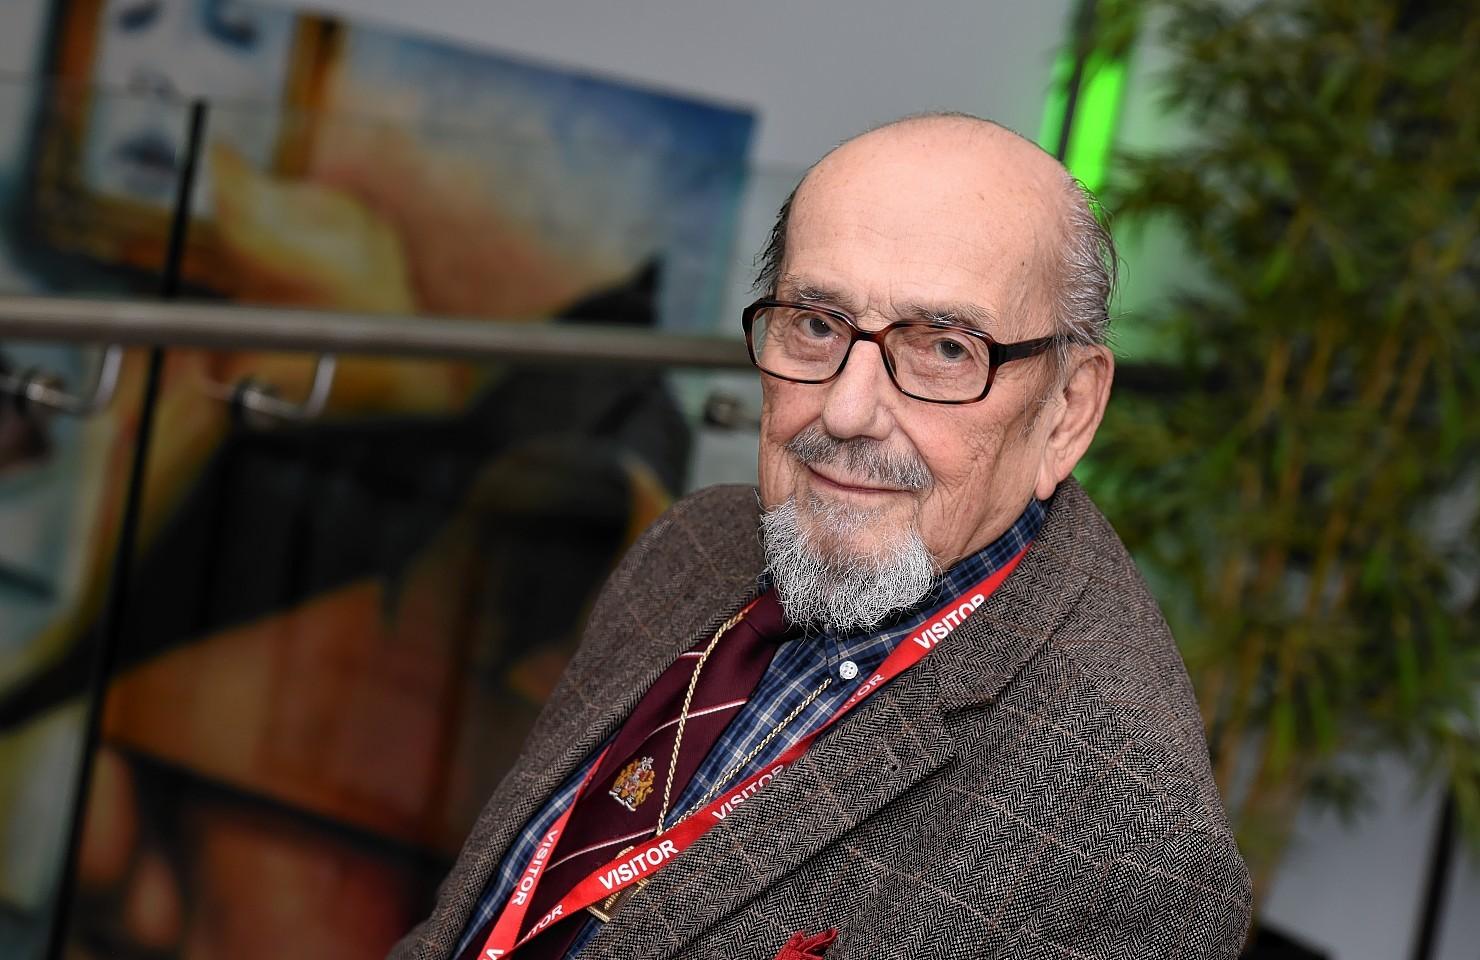 Holocaust survivor Harry Bibring